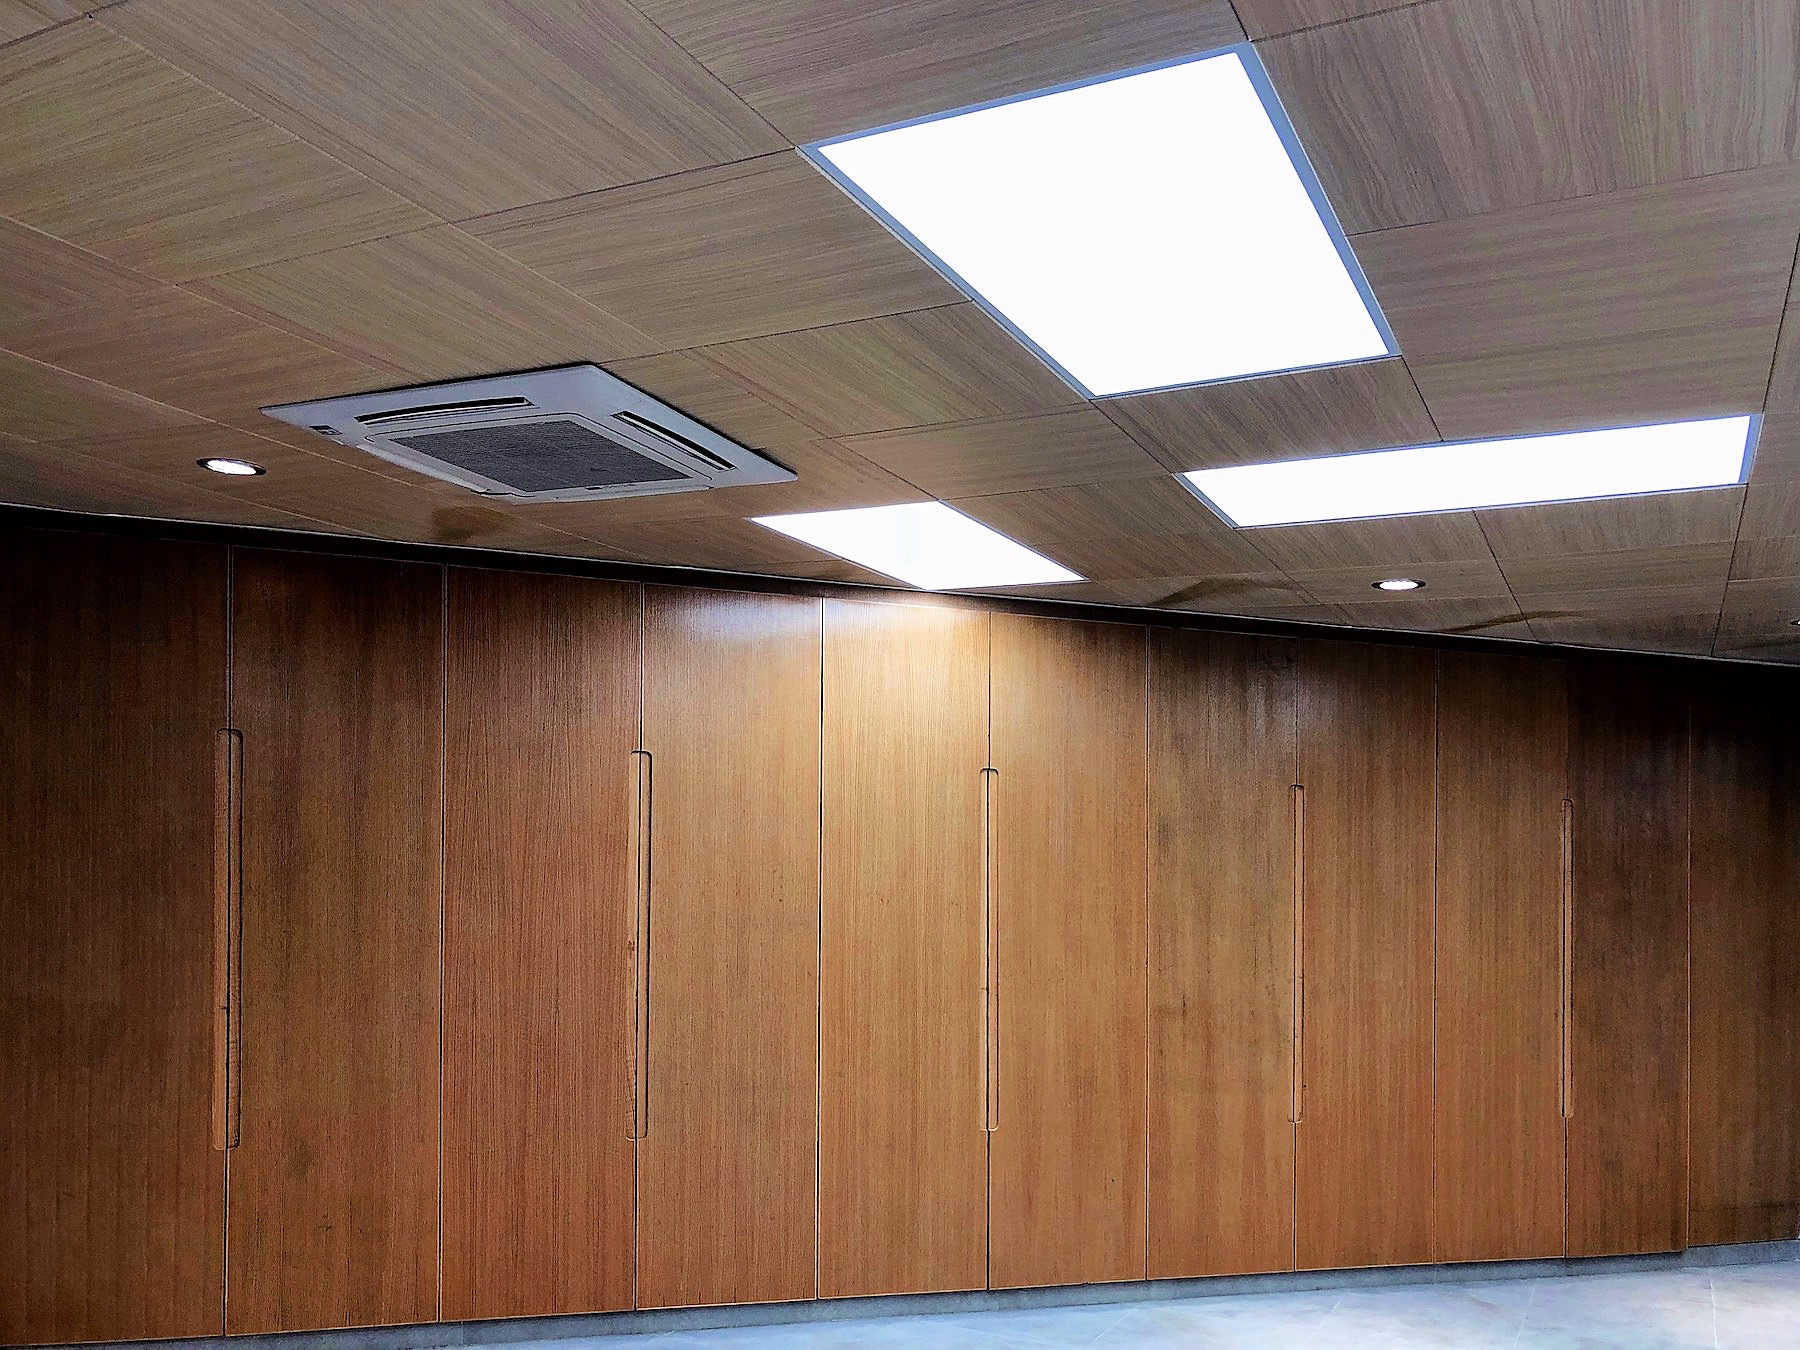 Grandway Office Renovation 2018 Multi Function Room 02 008